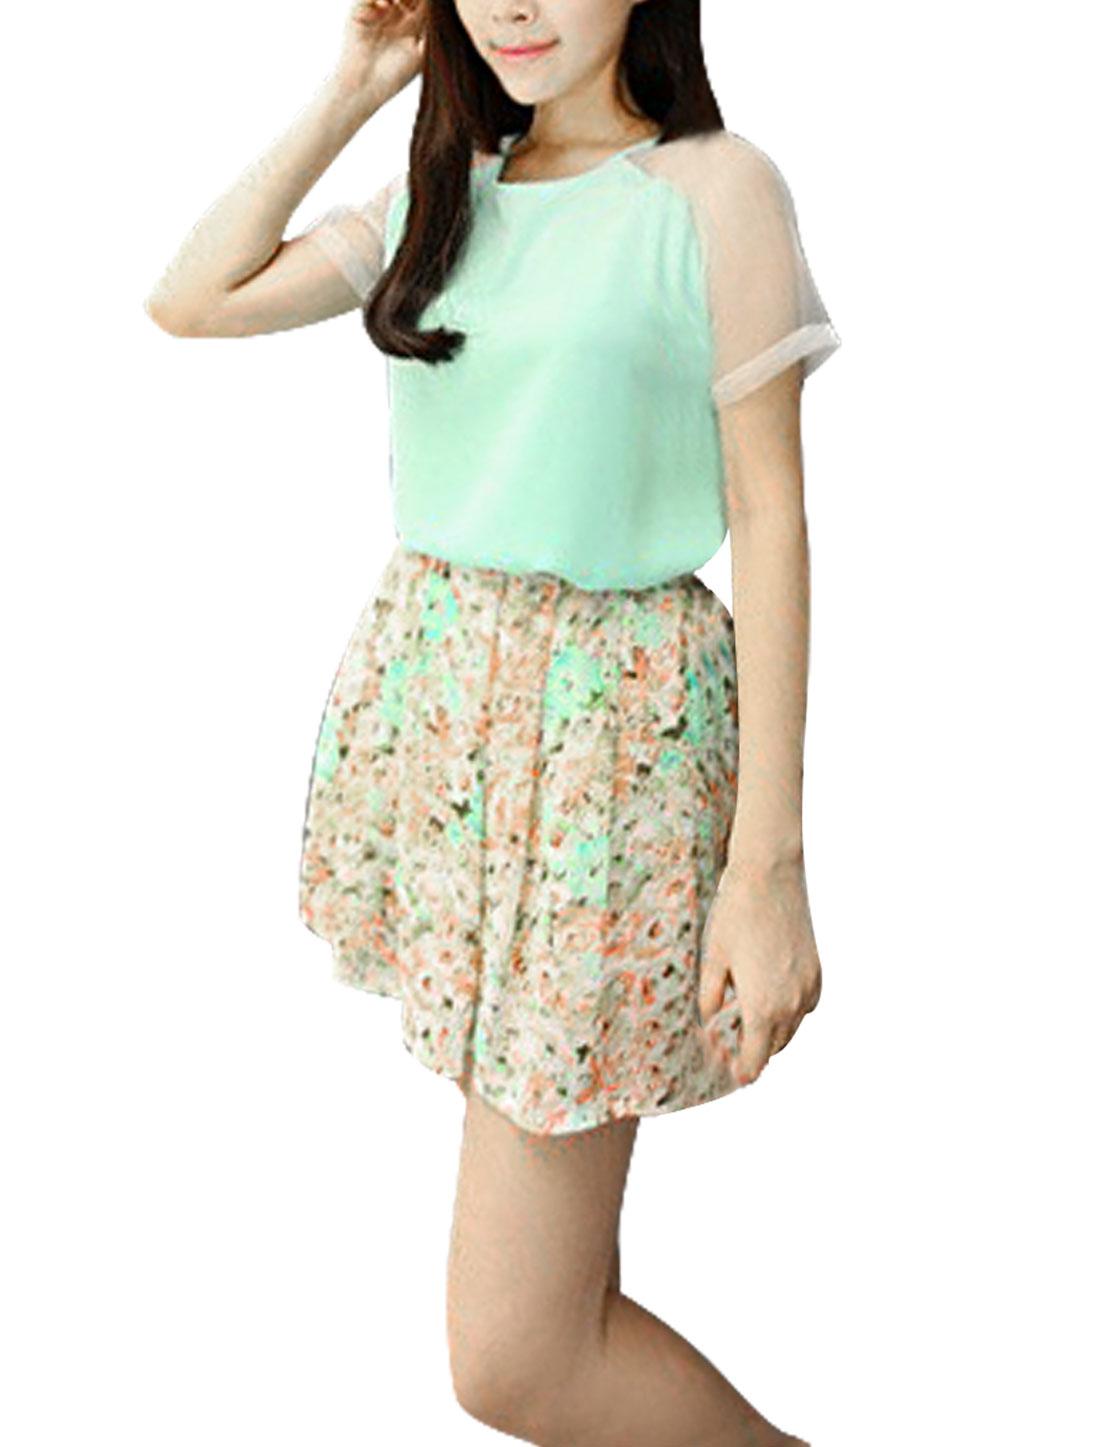 Ladies Round Neck Short Sleeve Chiffon Elegant Shirts Mint XS